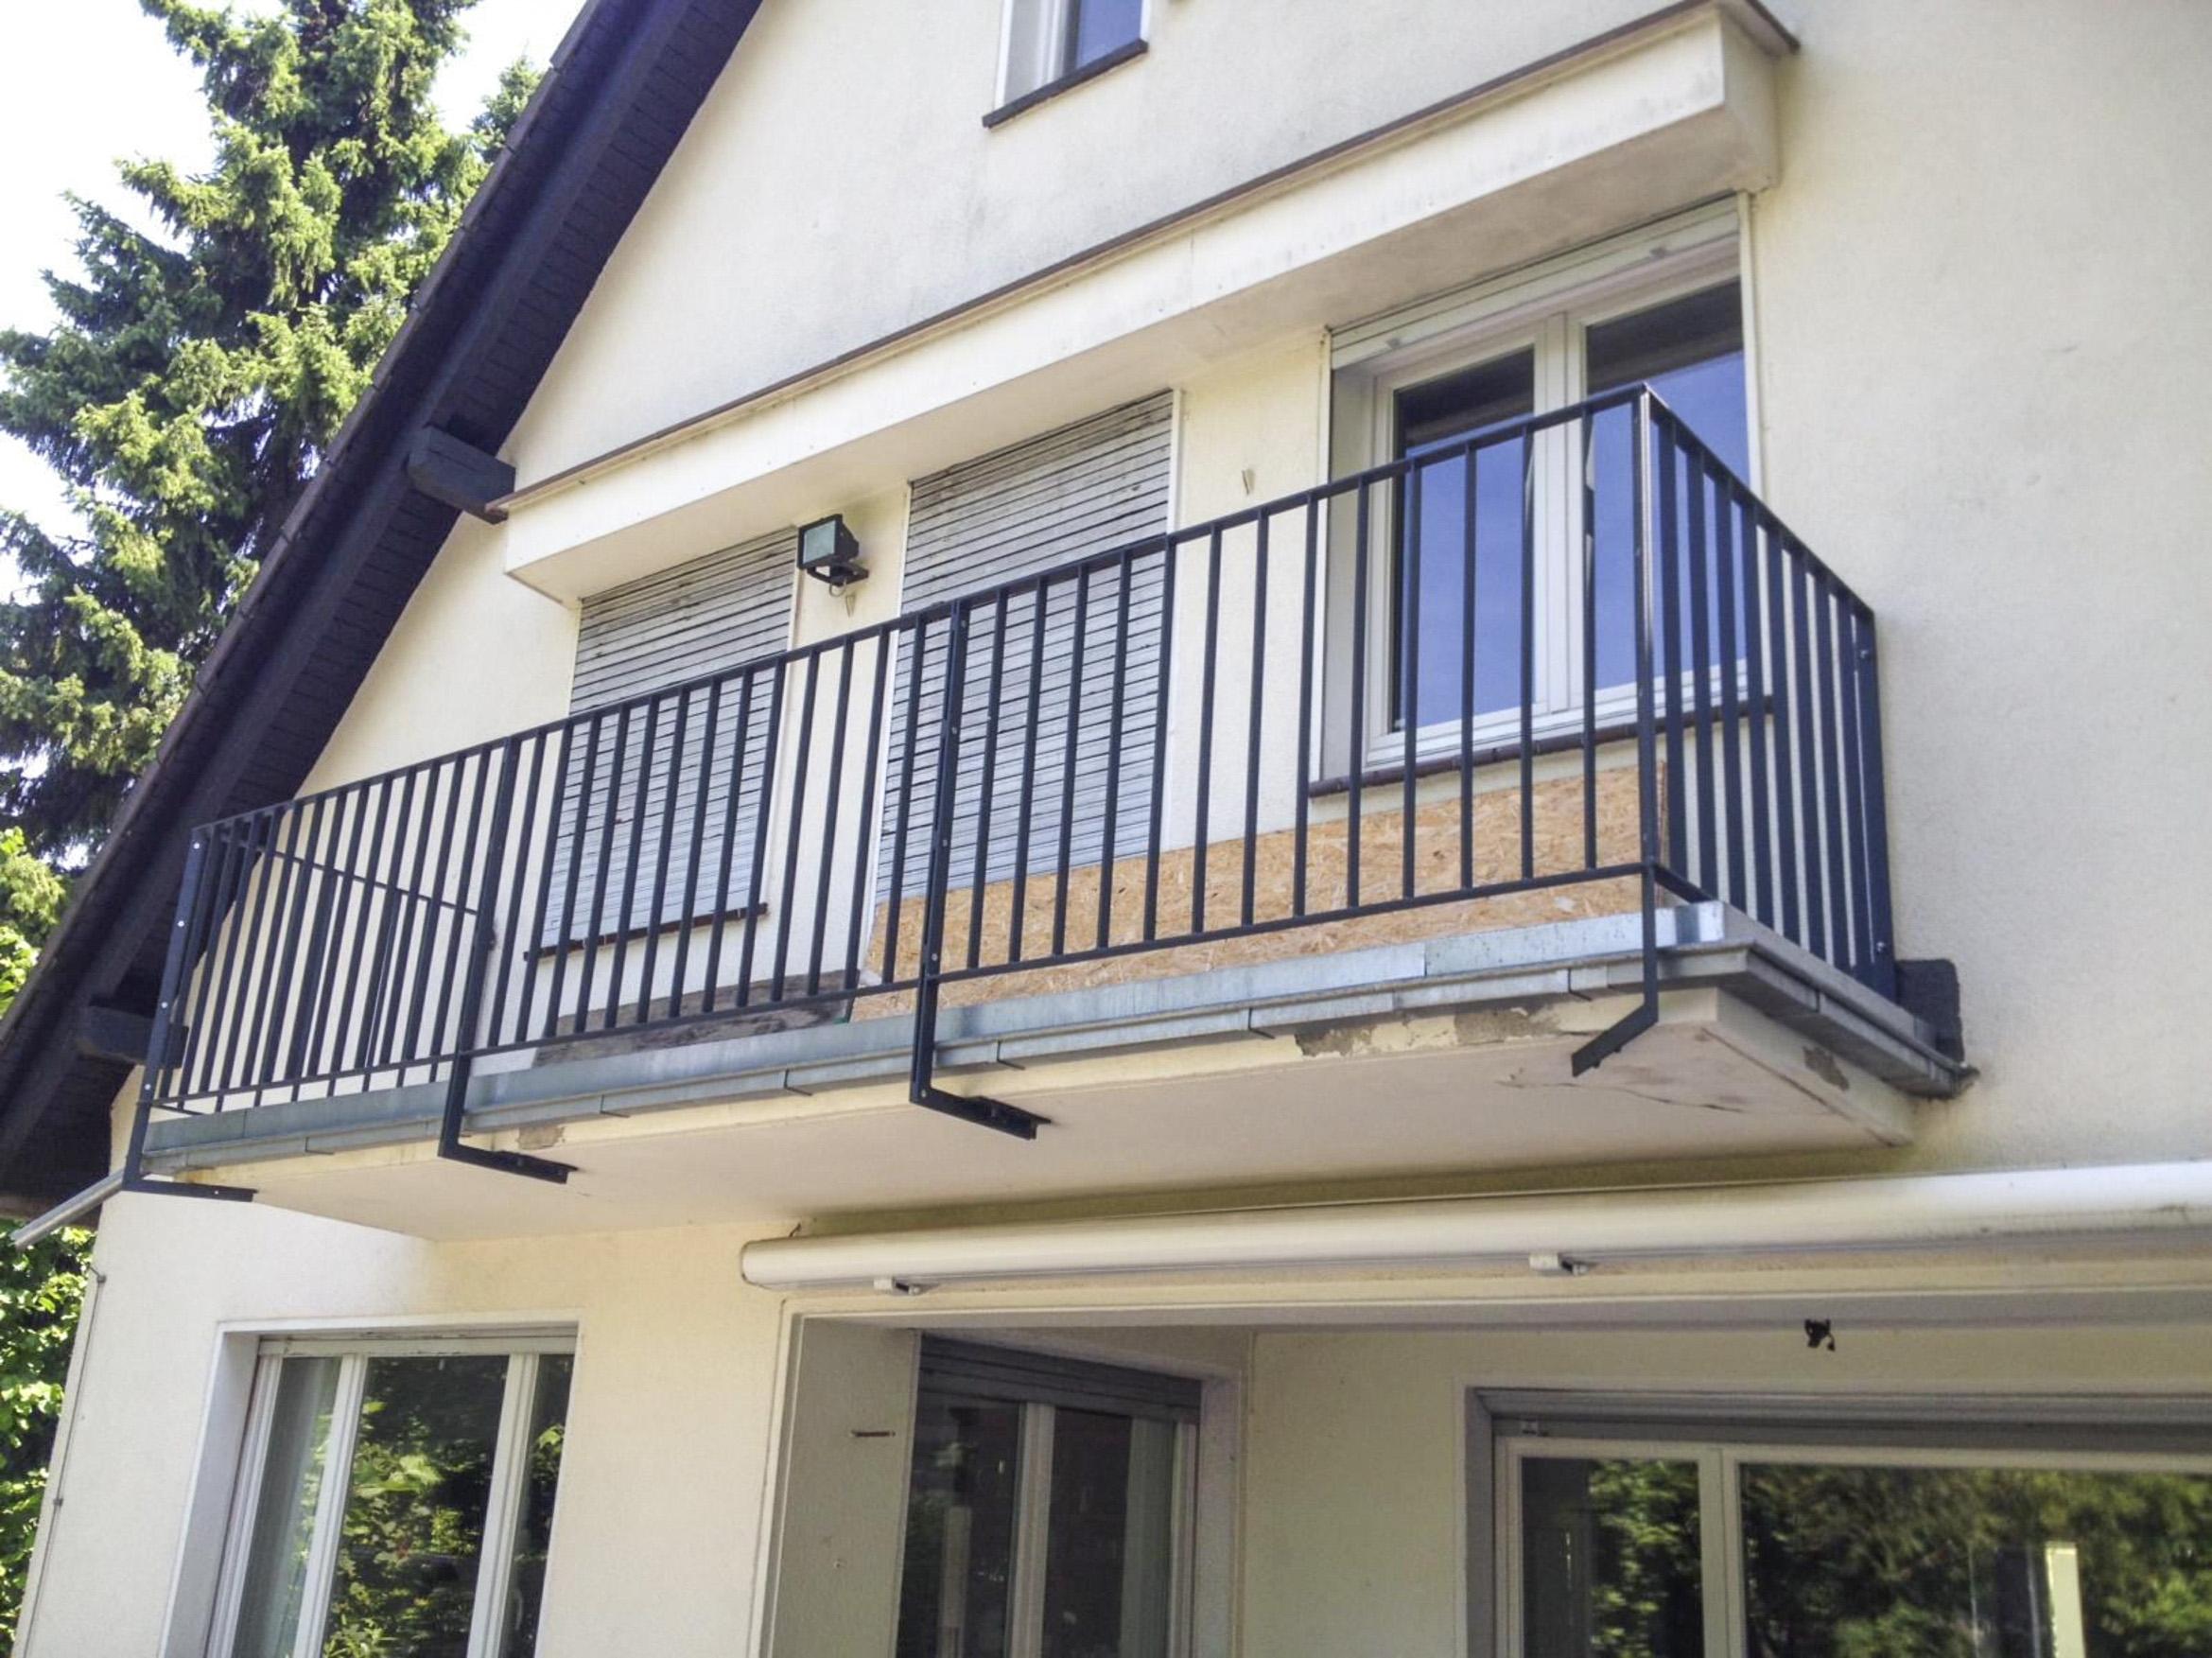 Balkone-IMG-20190627-WA0021ML-001-001